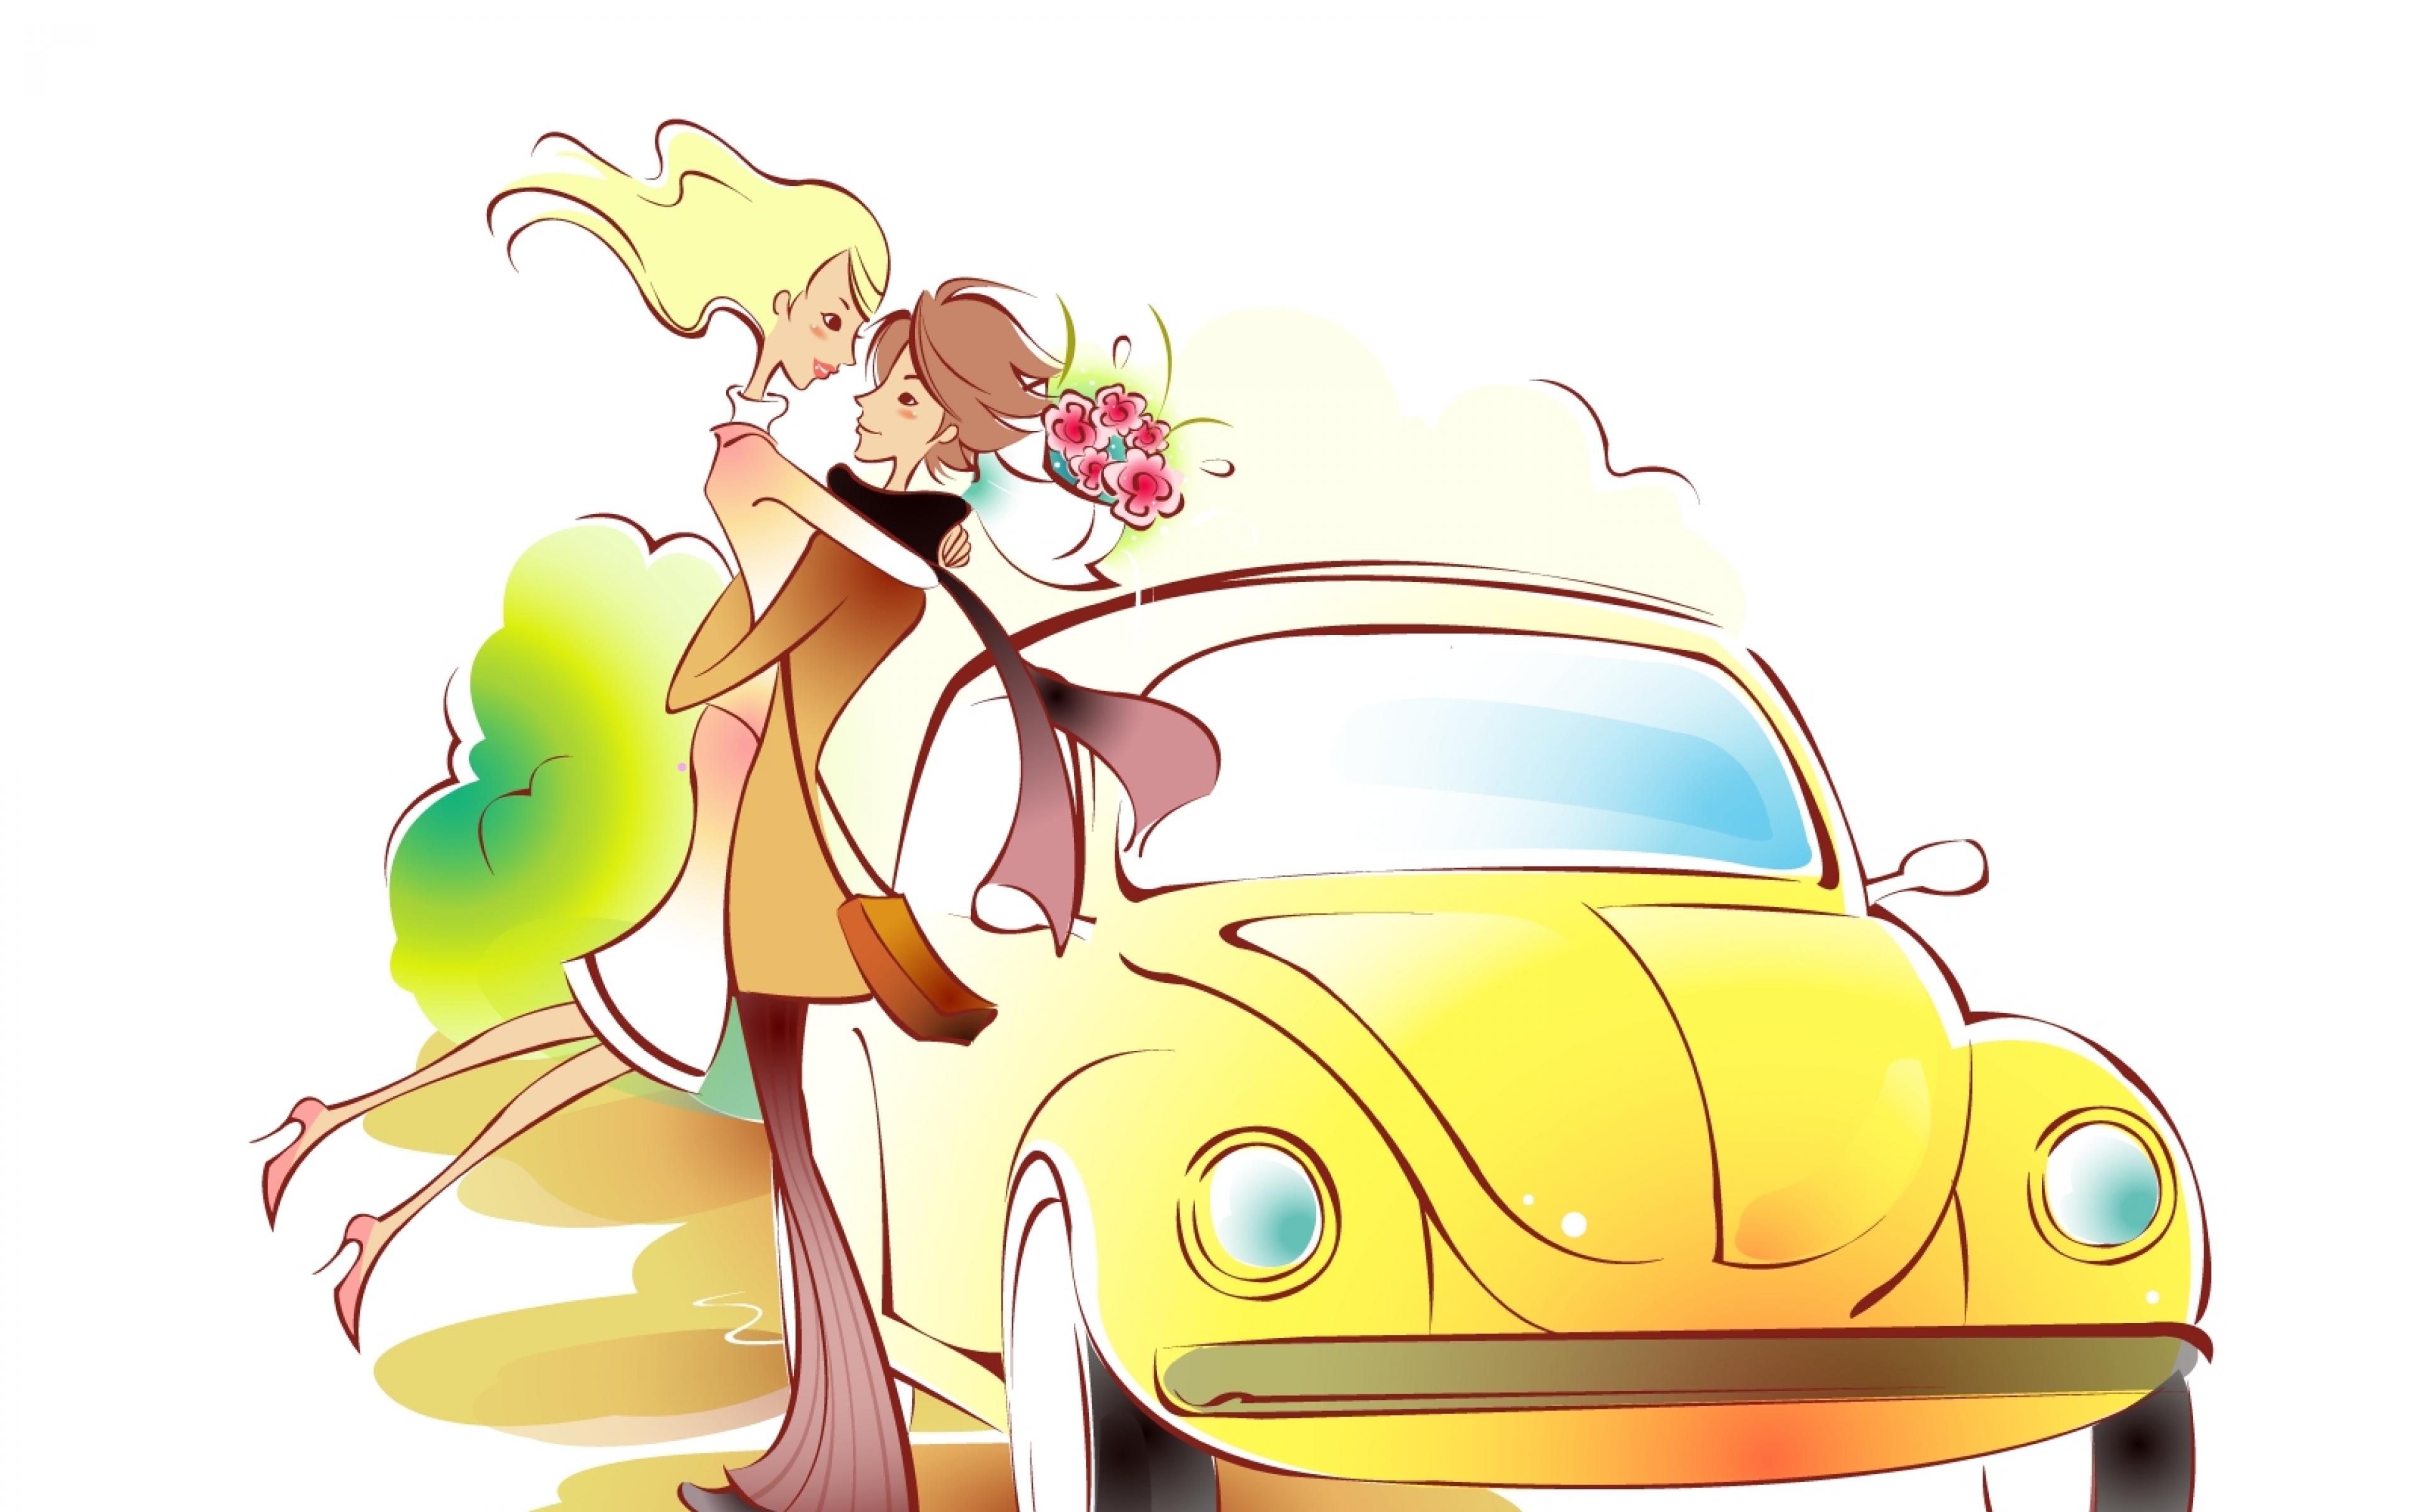 3840x2400 Download Wallpaper 3840x2400 Couple, Art, Drawing, Love, Car, Hug